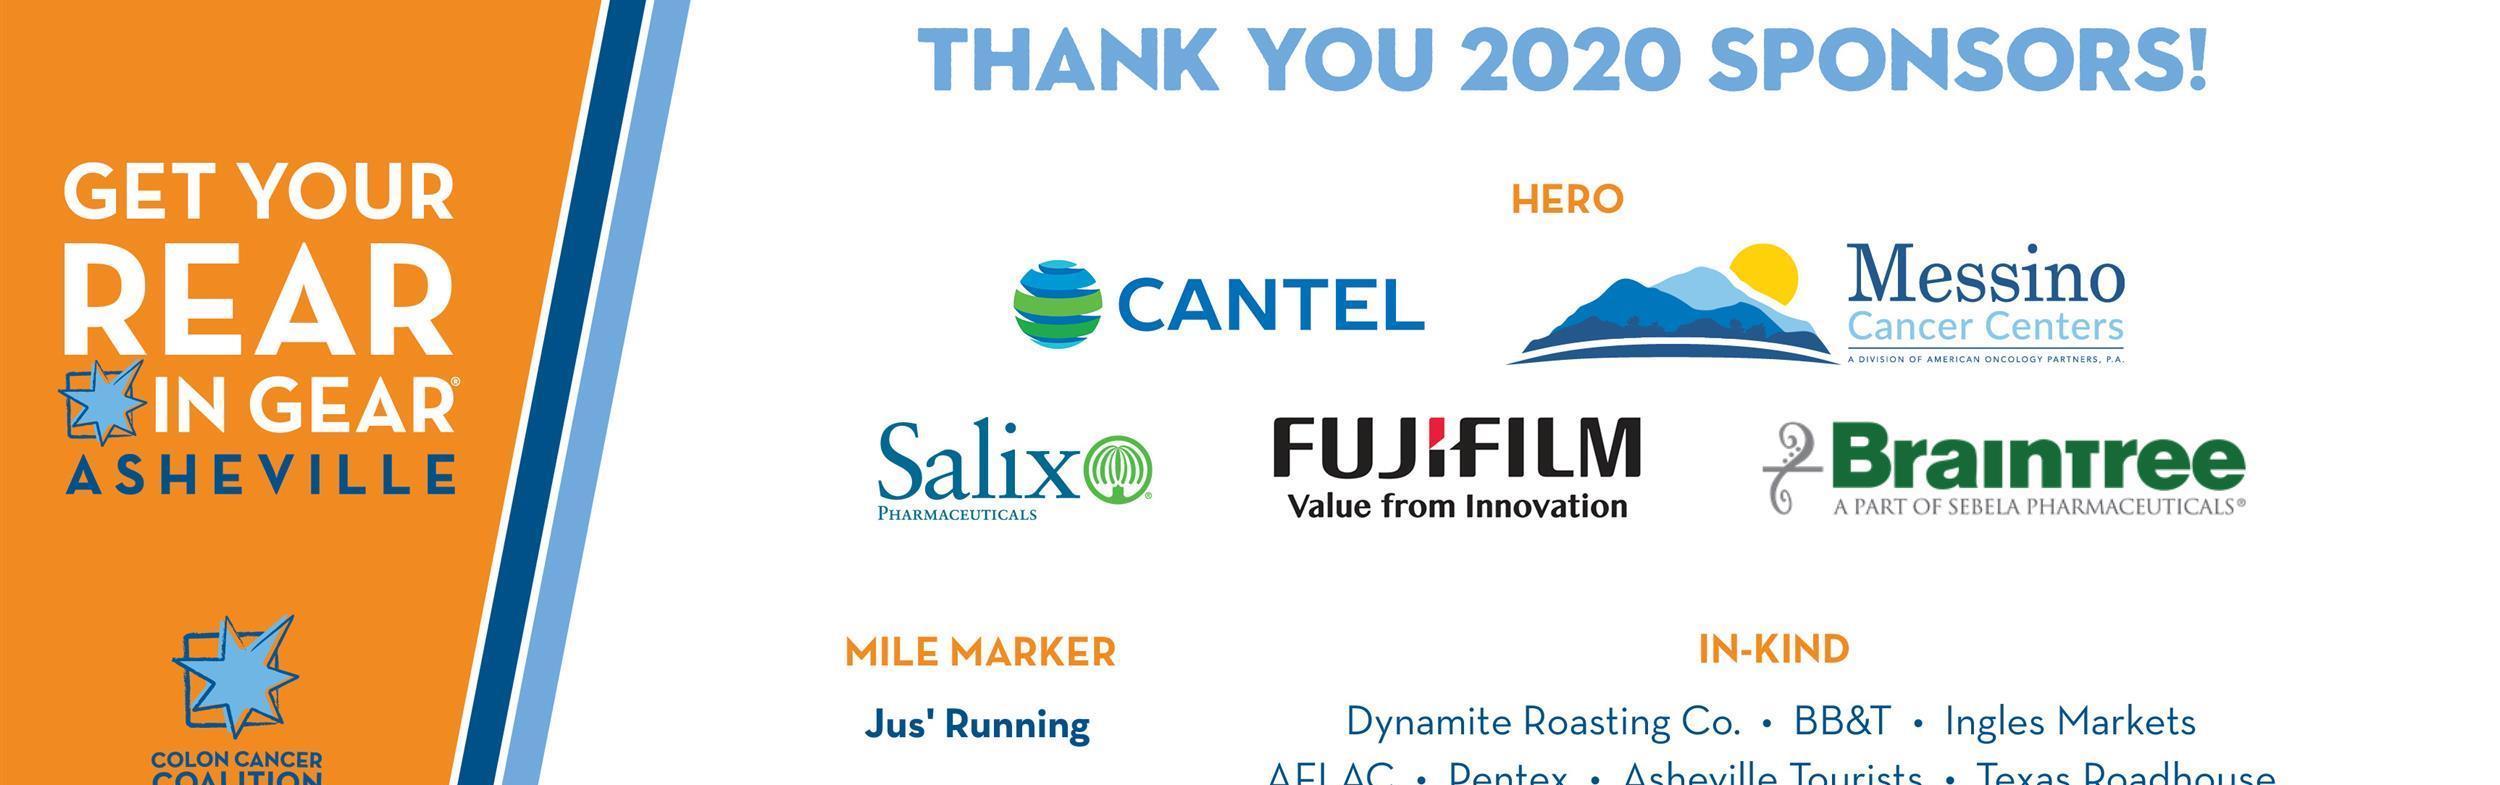 Virtual 2020 Get Your Rear In Gear Asheville